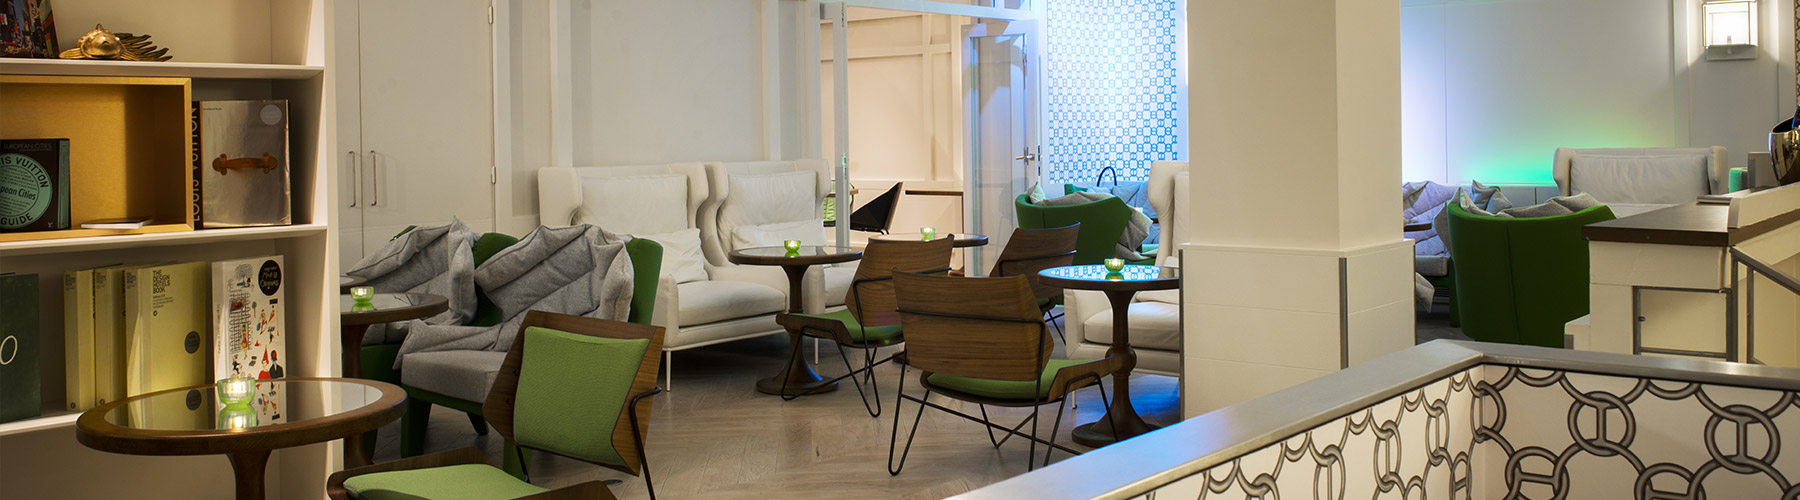 saint germain des pr s par s el hotel bel ami viajeros online. Black Bedroom Furniture Sets. Home Design Ideas